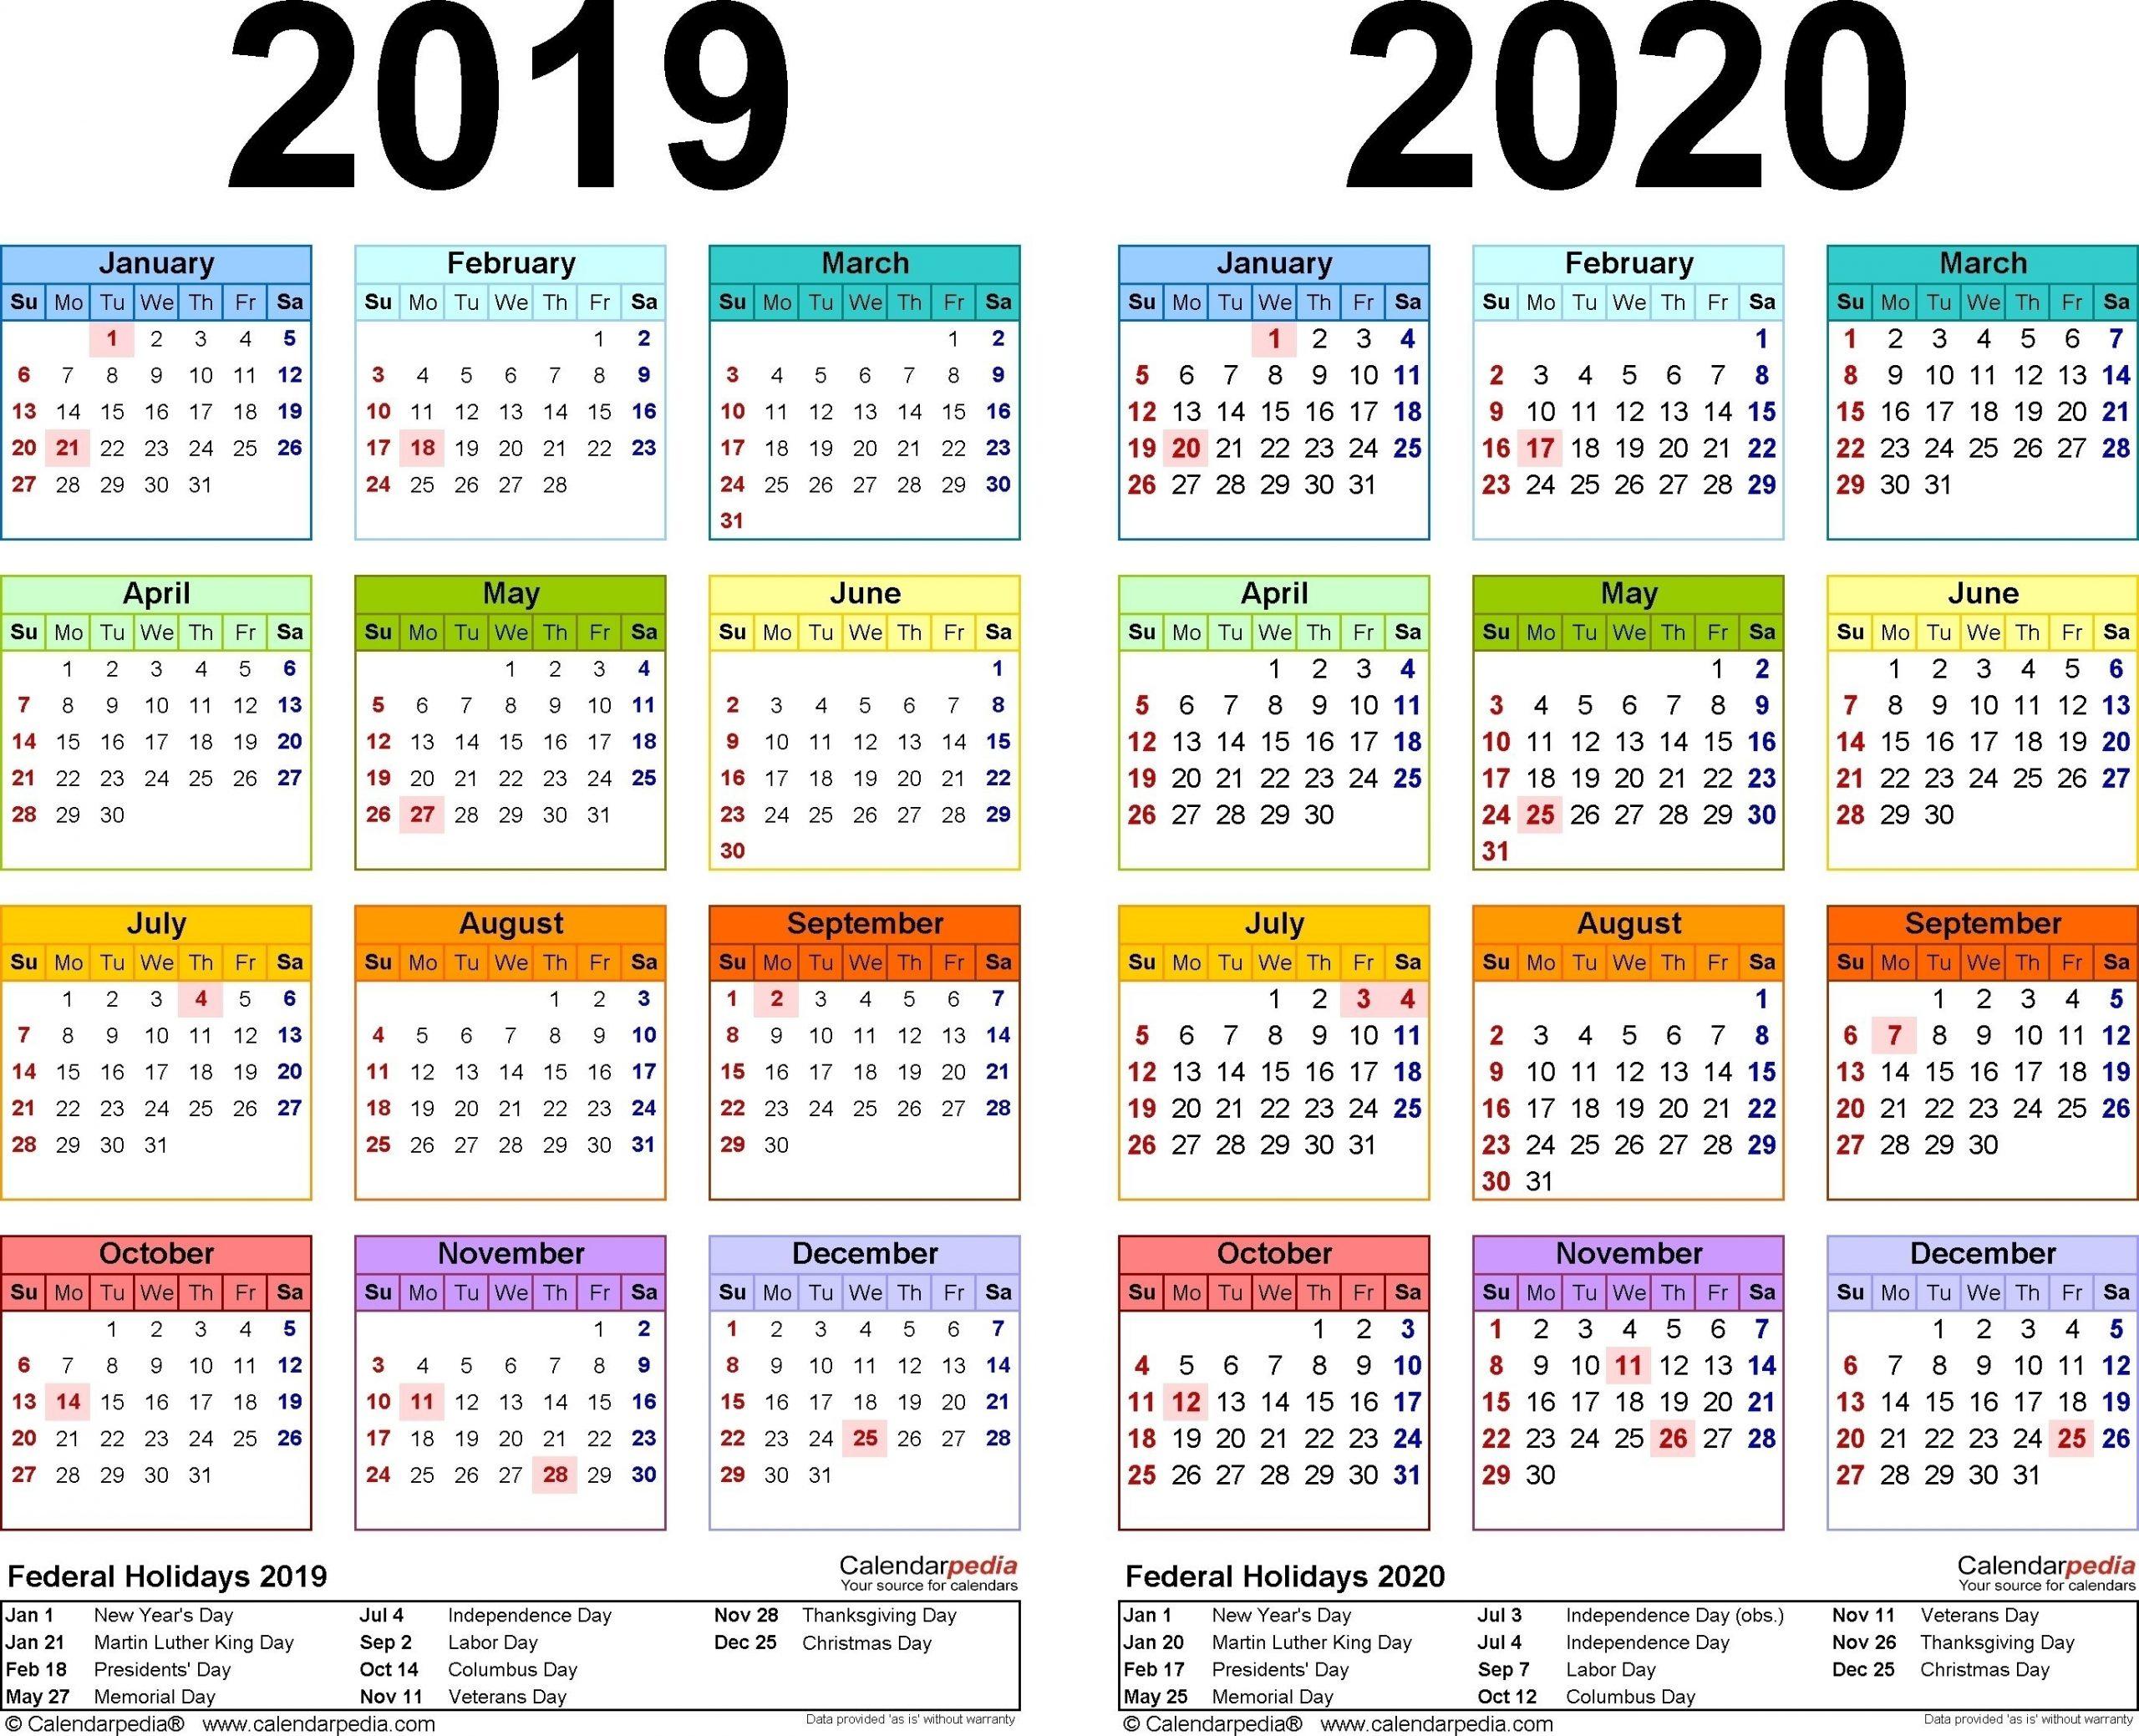 Extraordinary Hong Kong Public Holidays 2020 In 2020